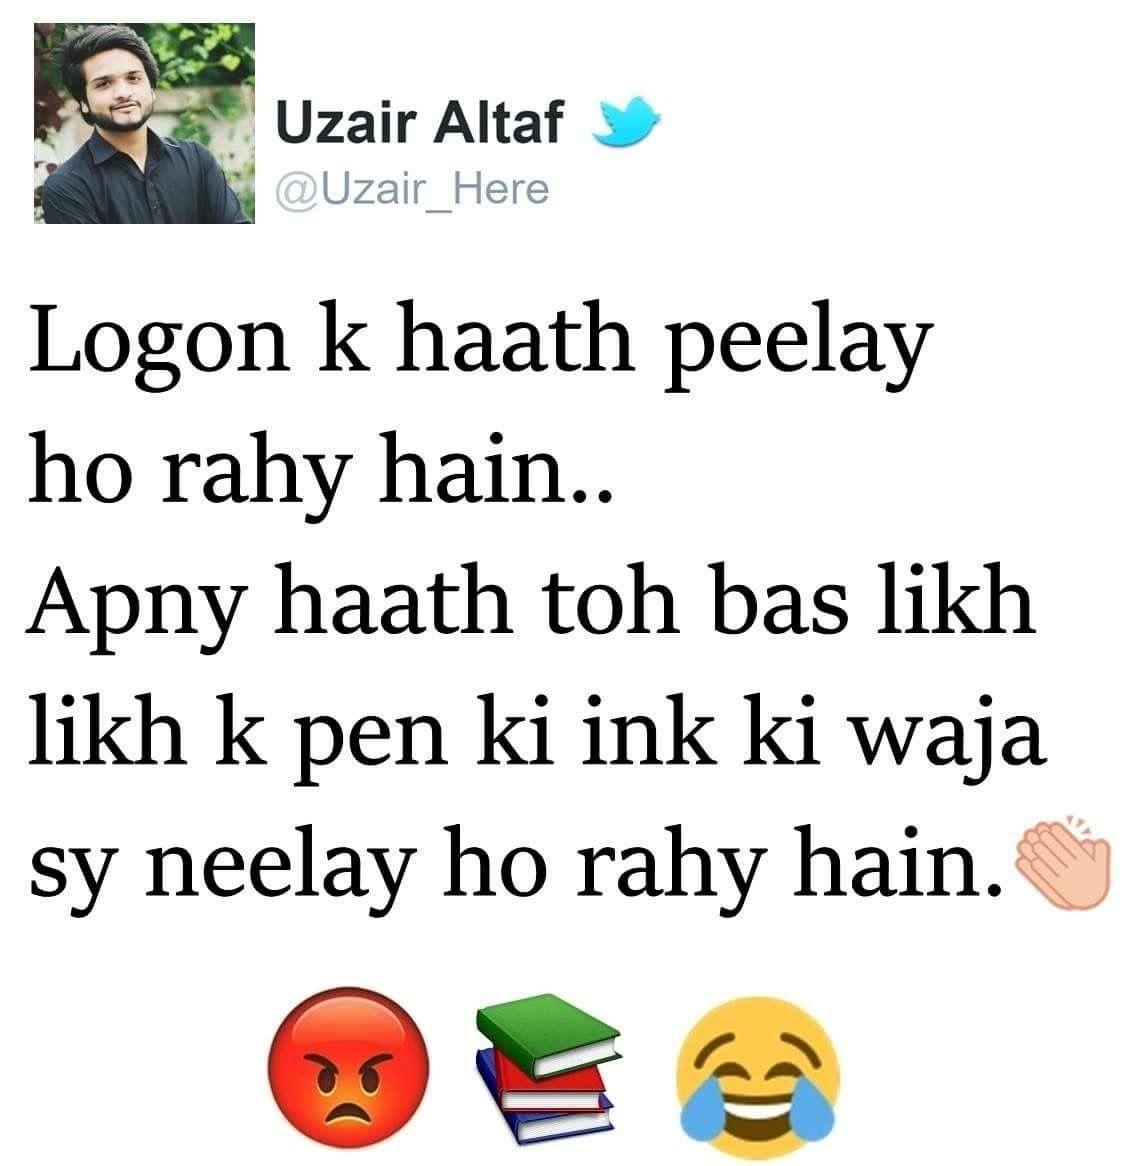 Hahahha Itta Parhte Hai Hum Funny Study Quotes